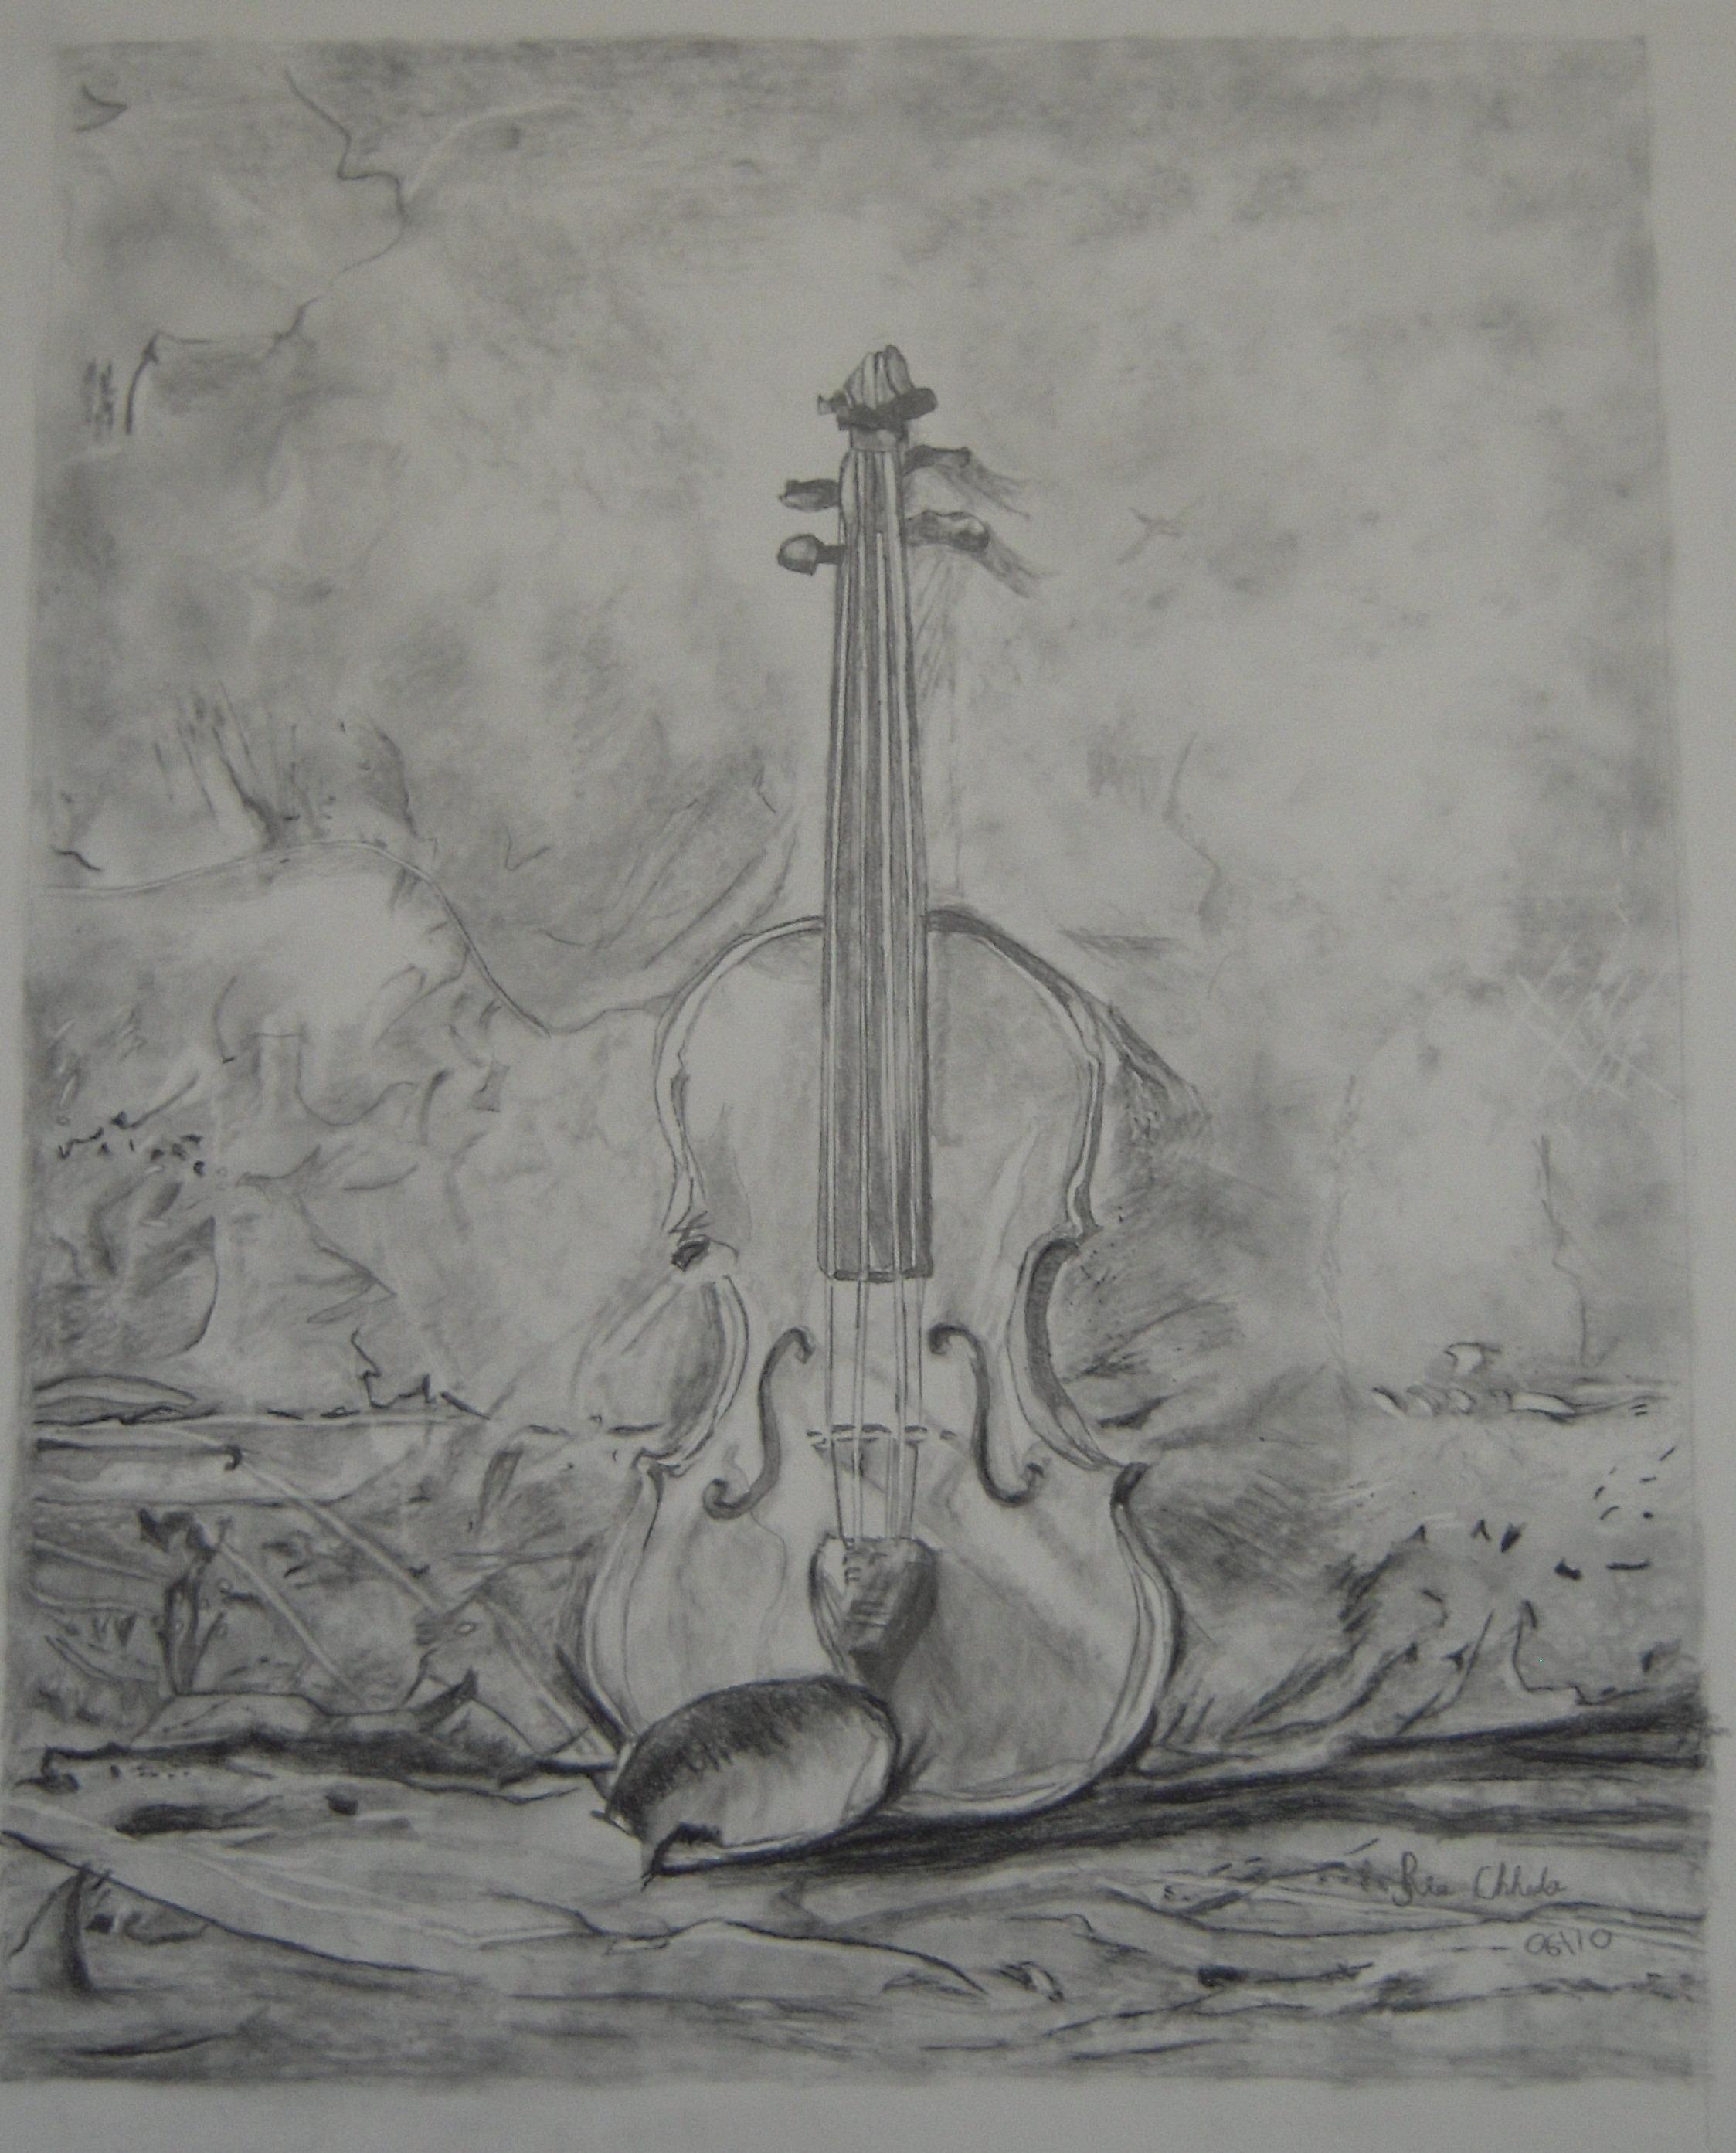 ASArtStudio.com